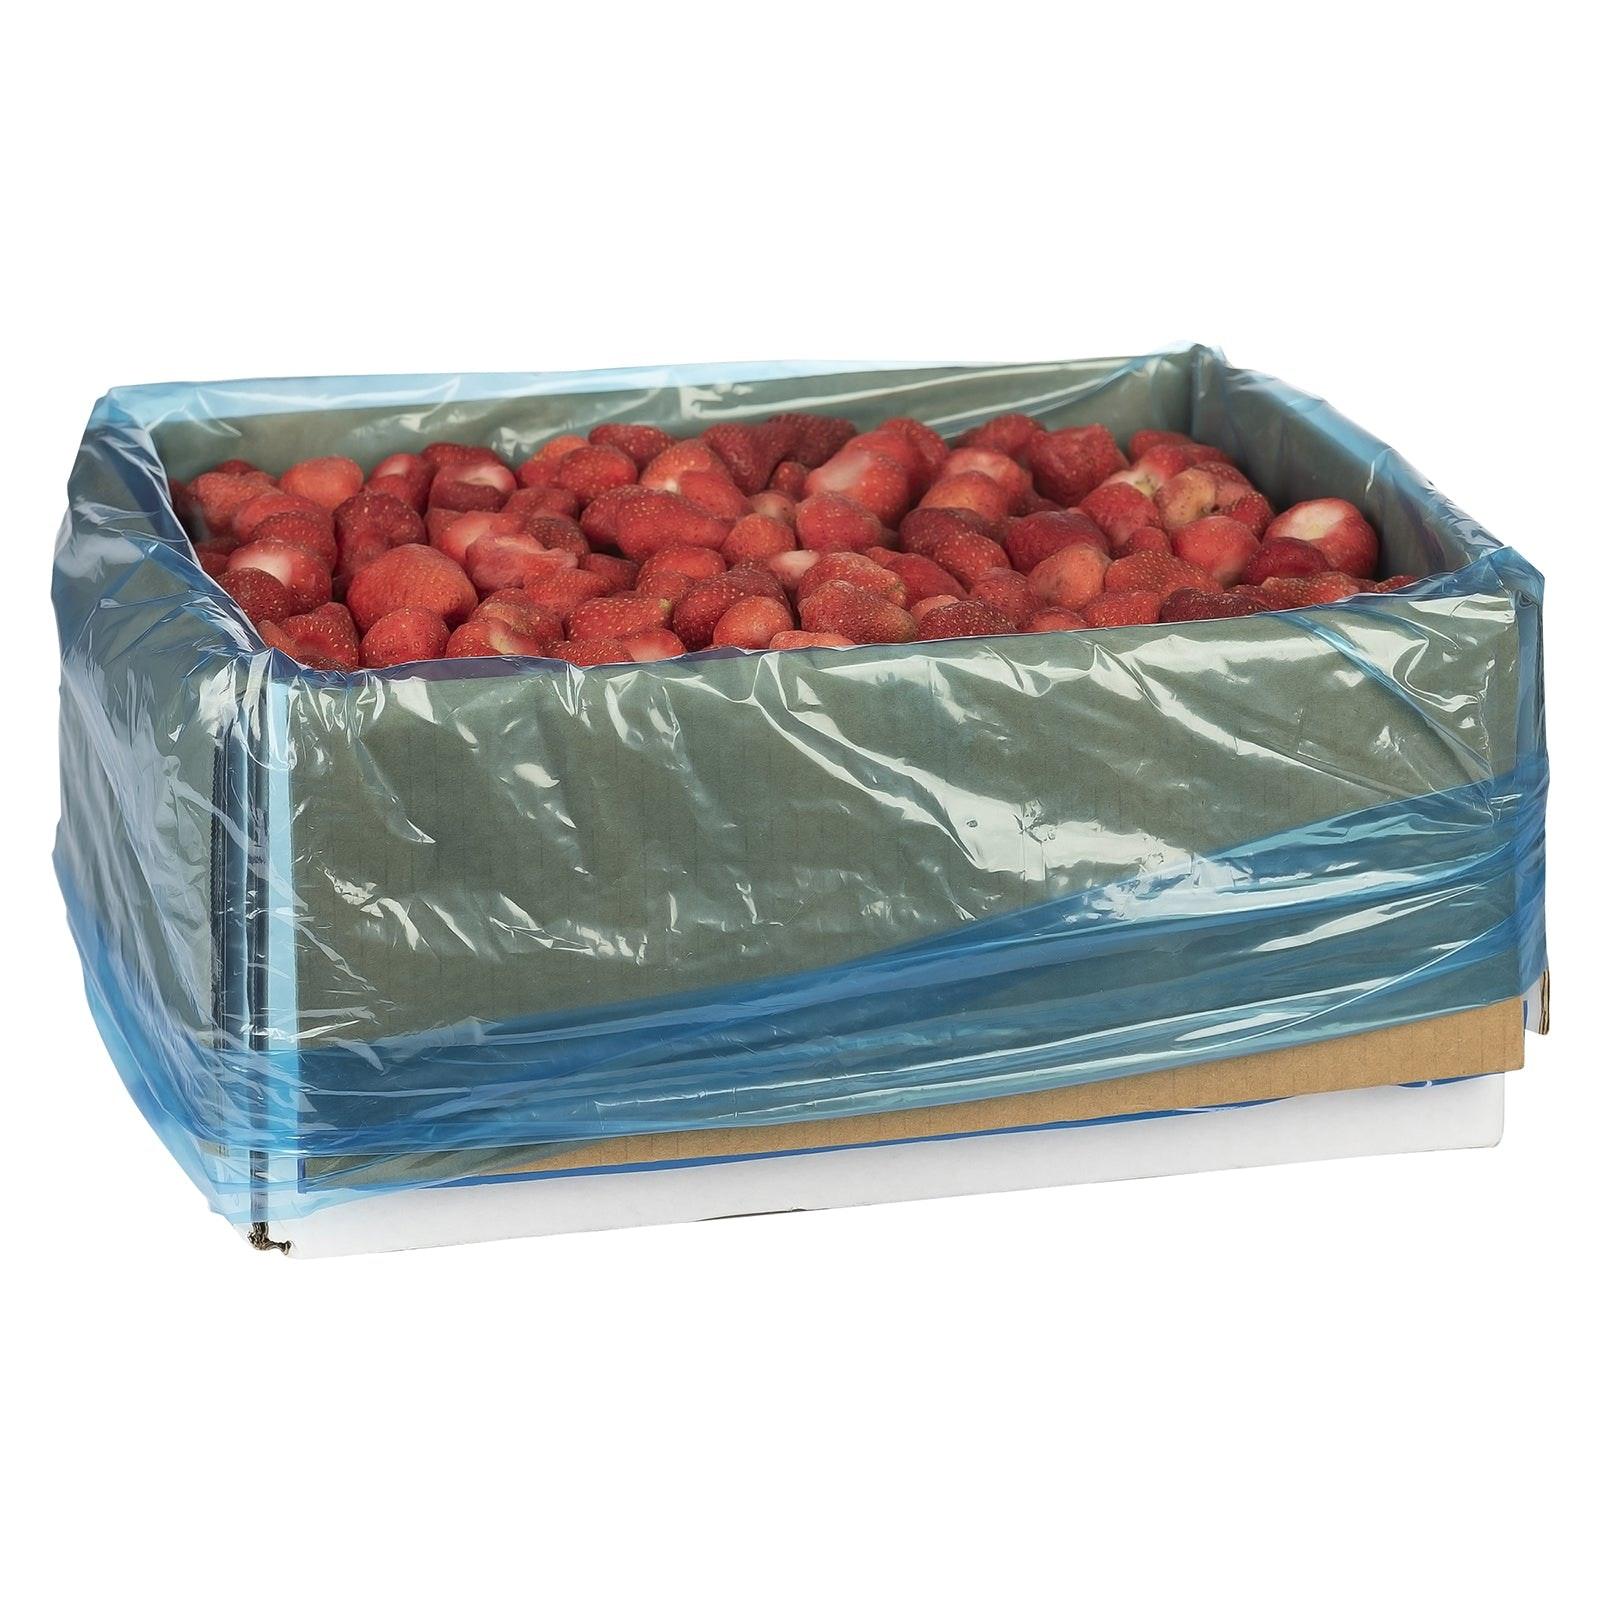 BELOW ZERO Whole strawberries